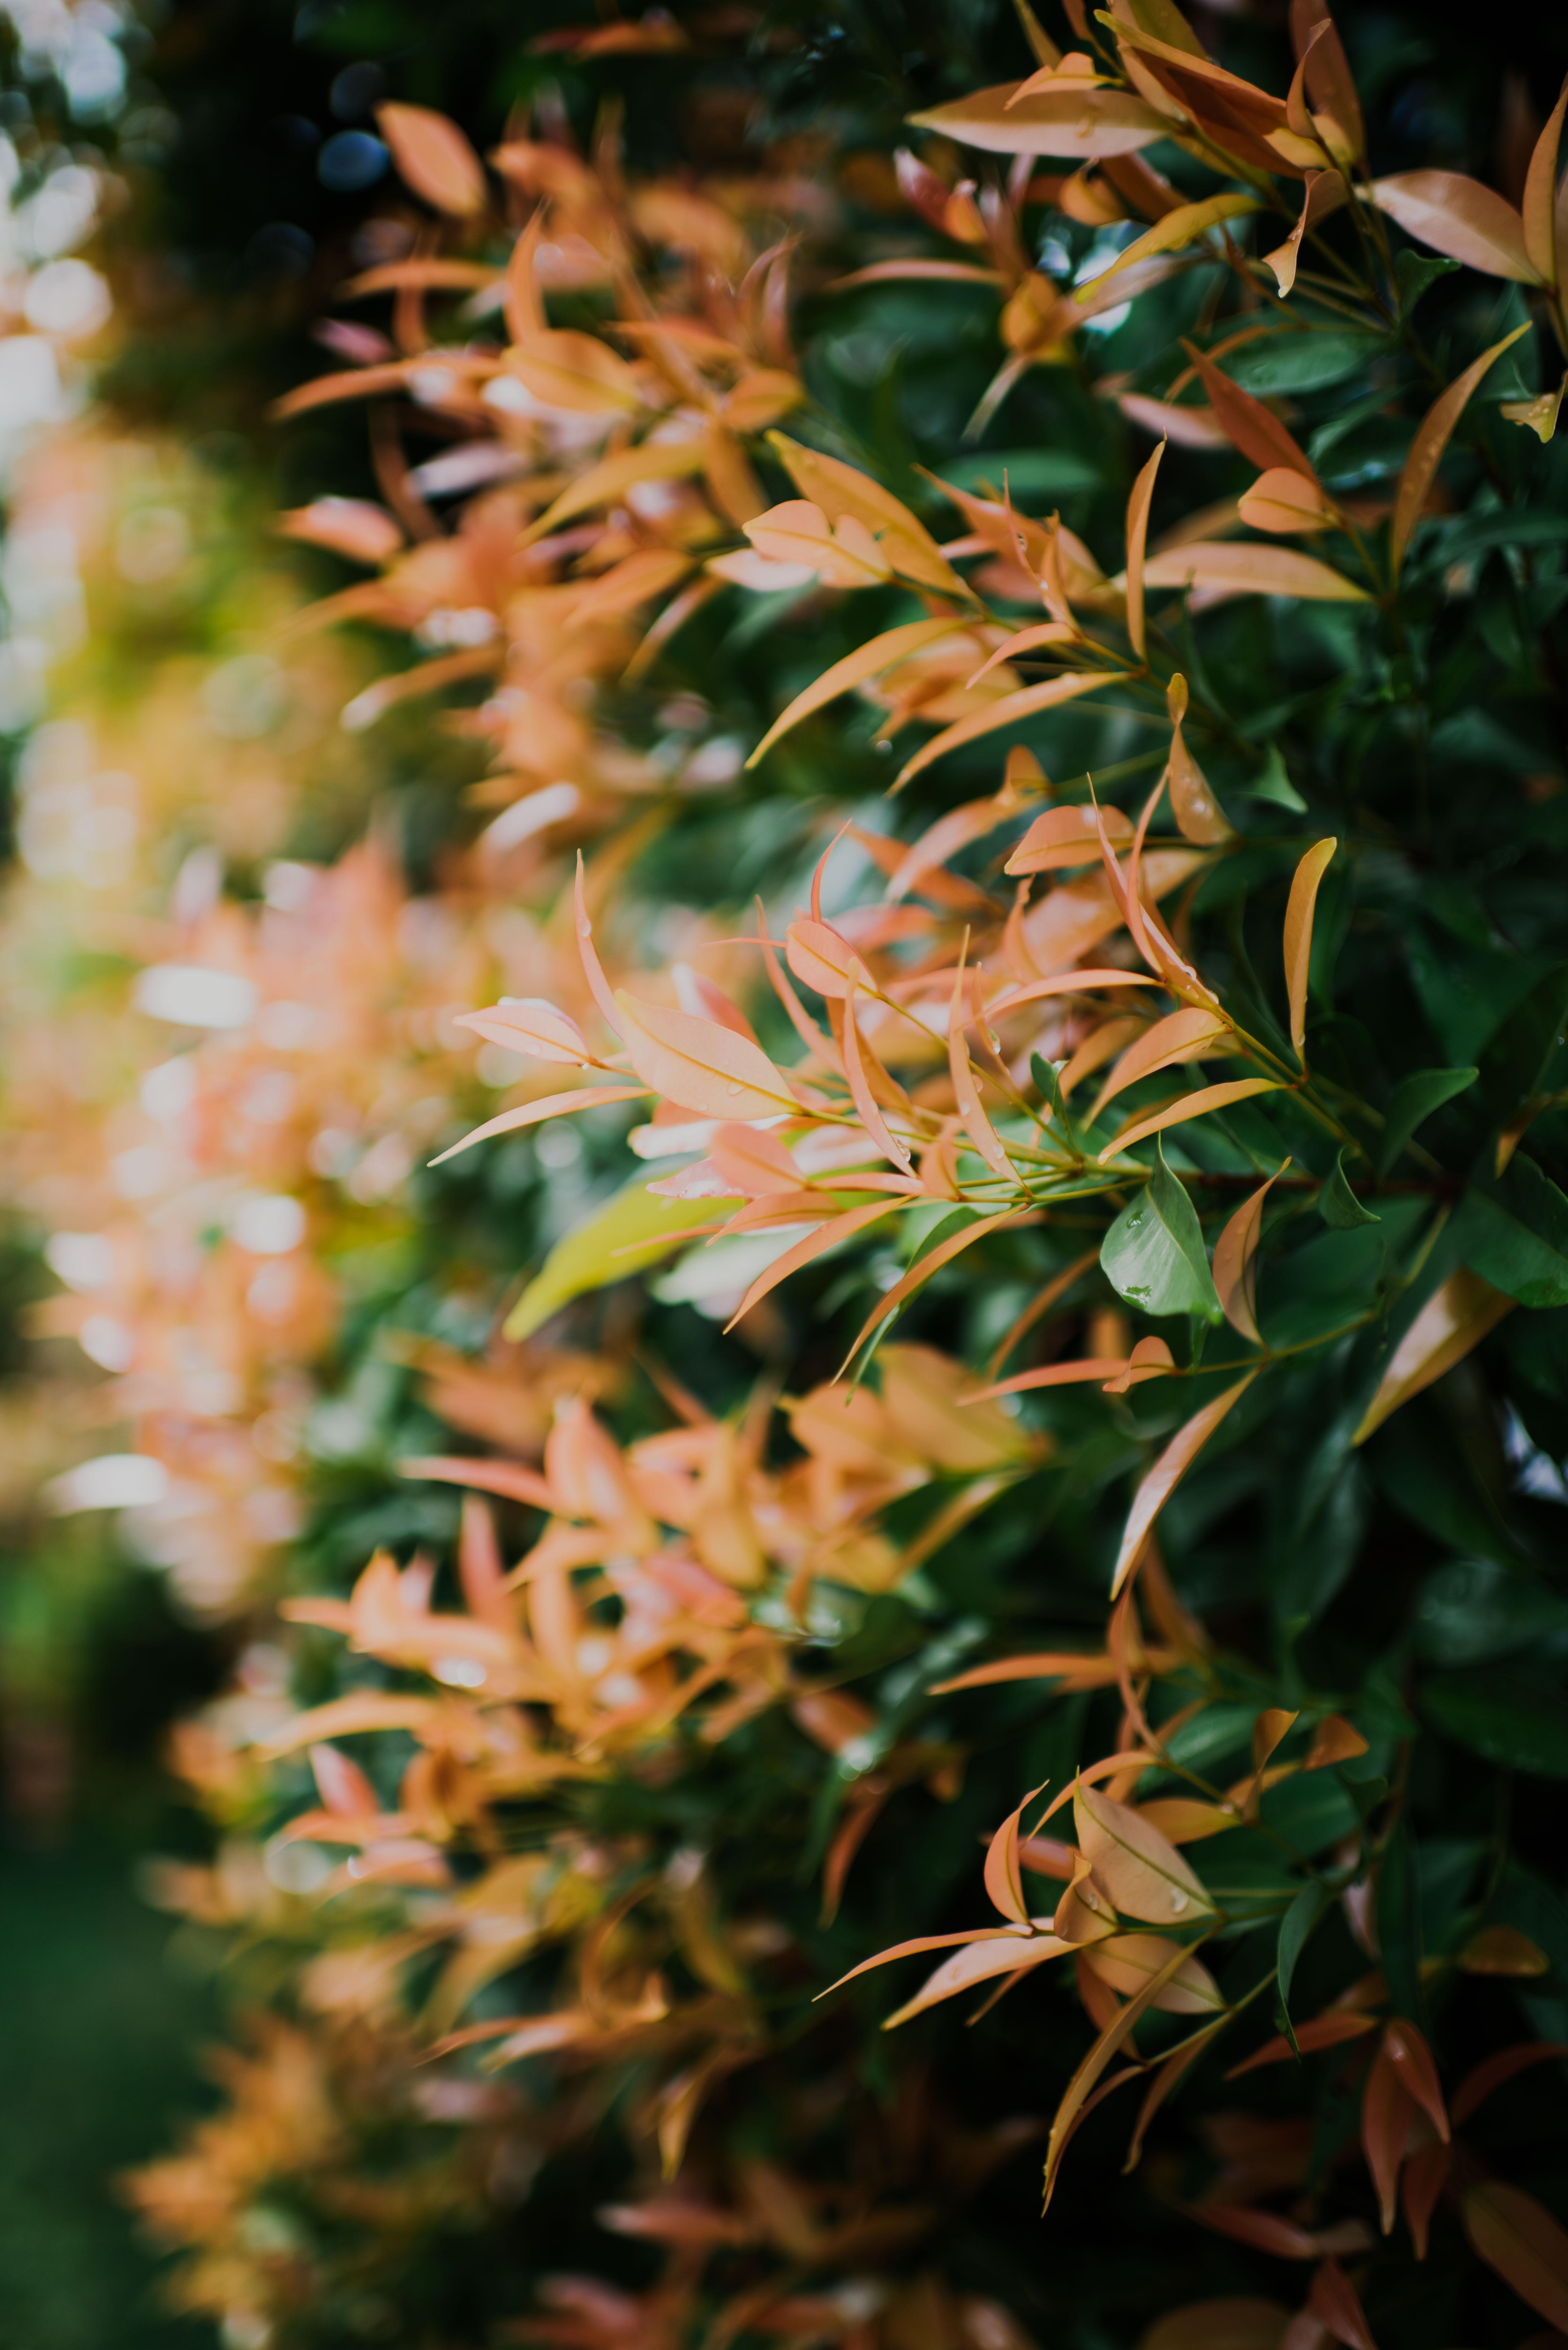 shallow focus photography of orange leafed plants